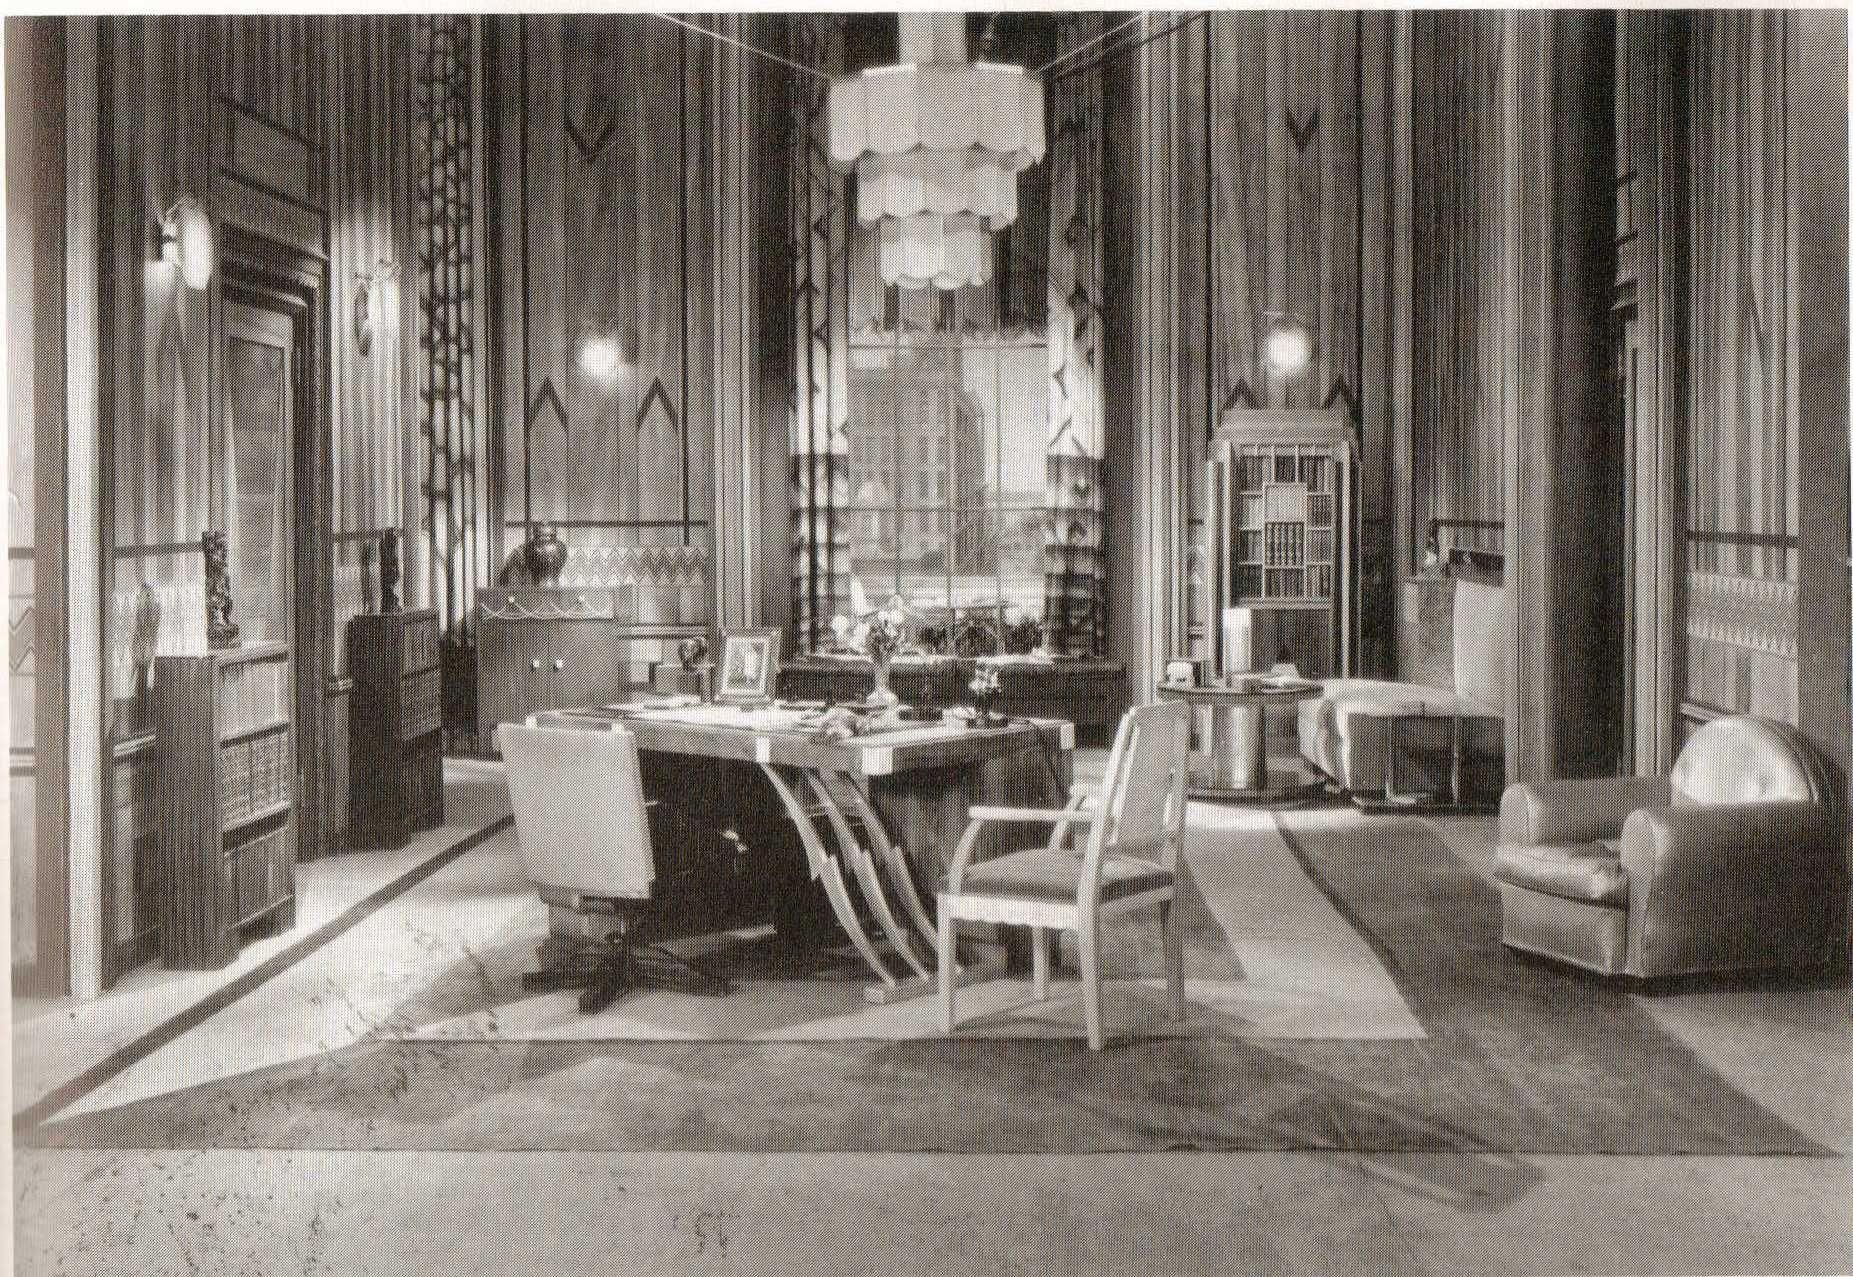 studio set design 1930 deco deco teatro y cine